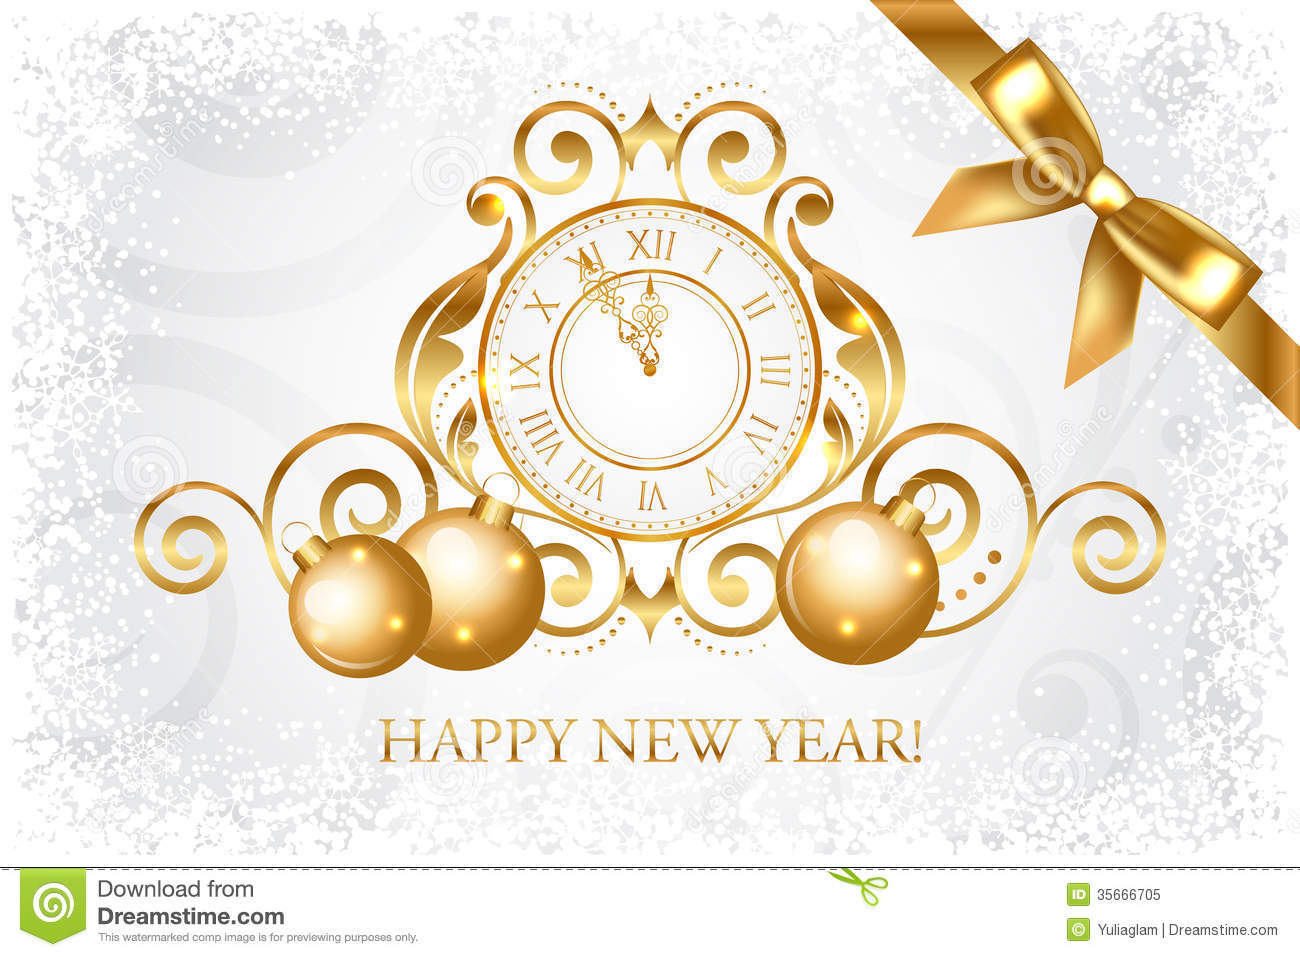 Wallpaper OF New Year Card 10642 - HDWPro